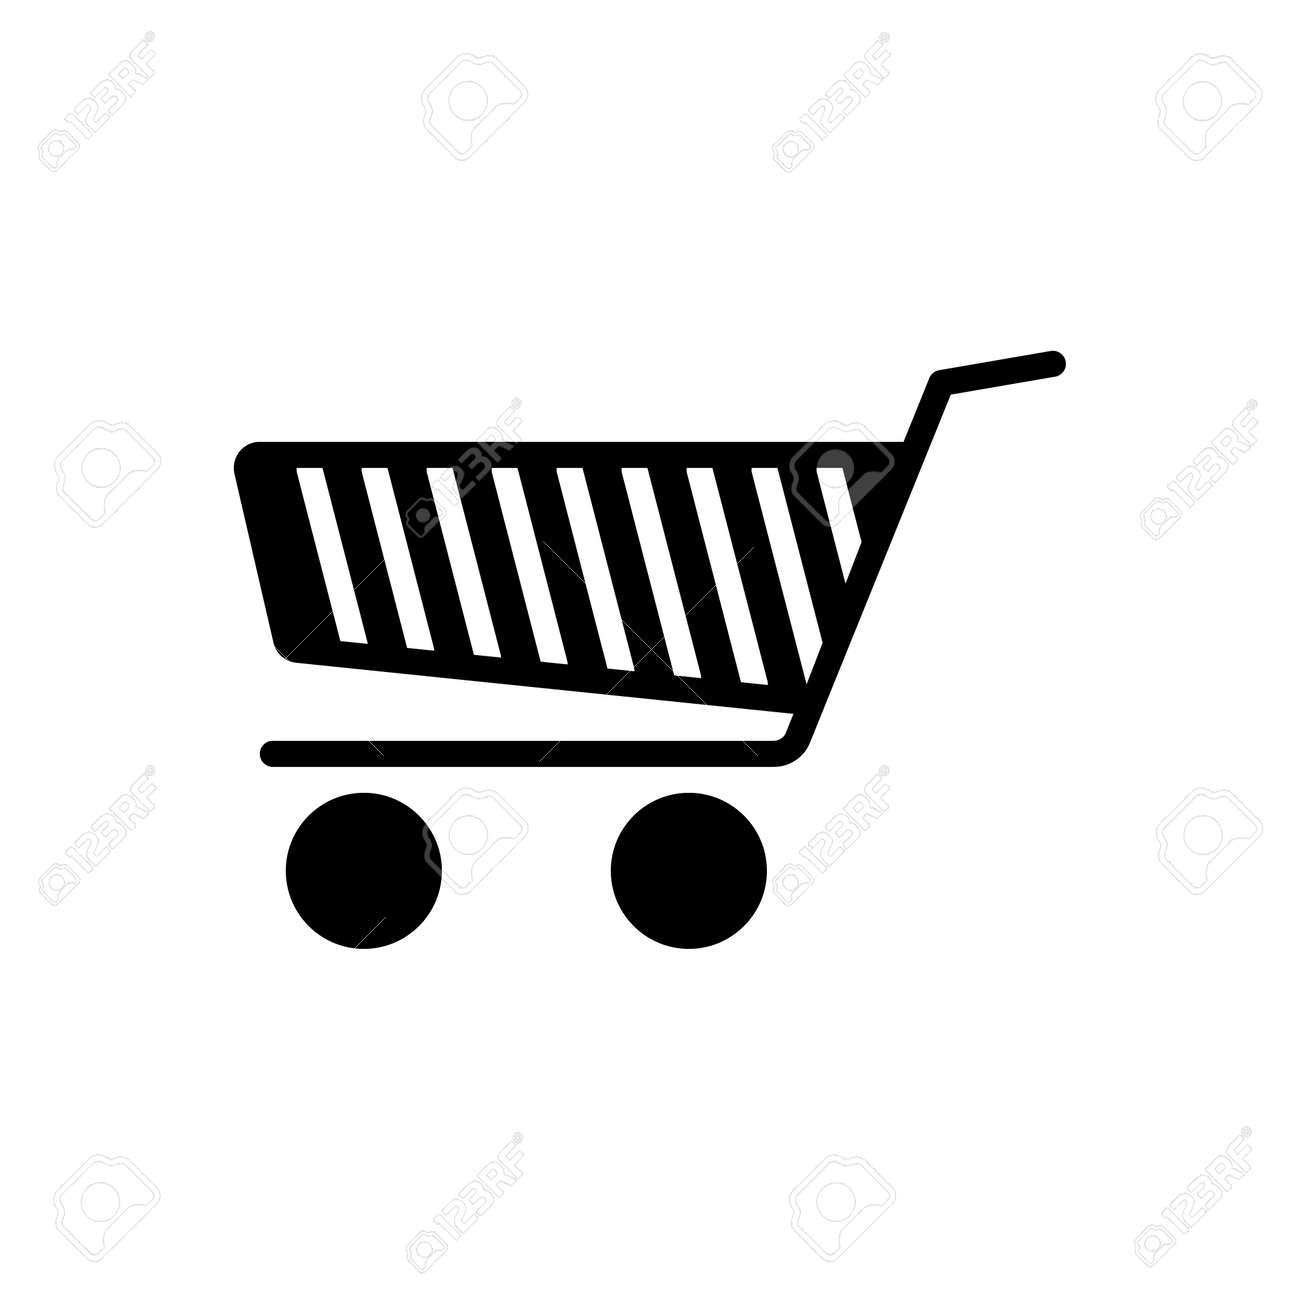 Icon for shopping cart, shopping - 172215069